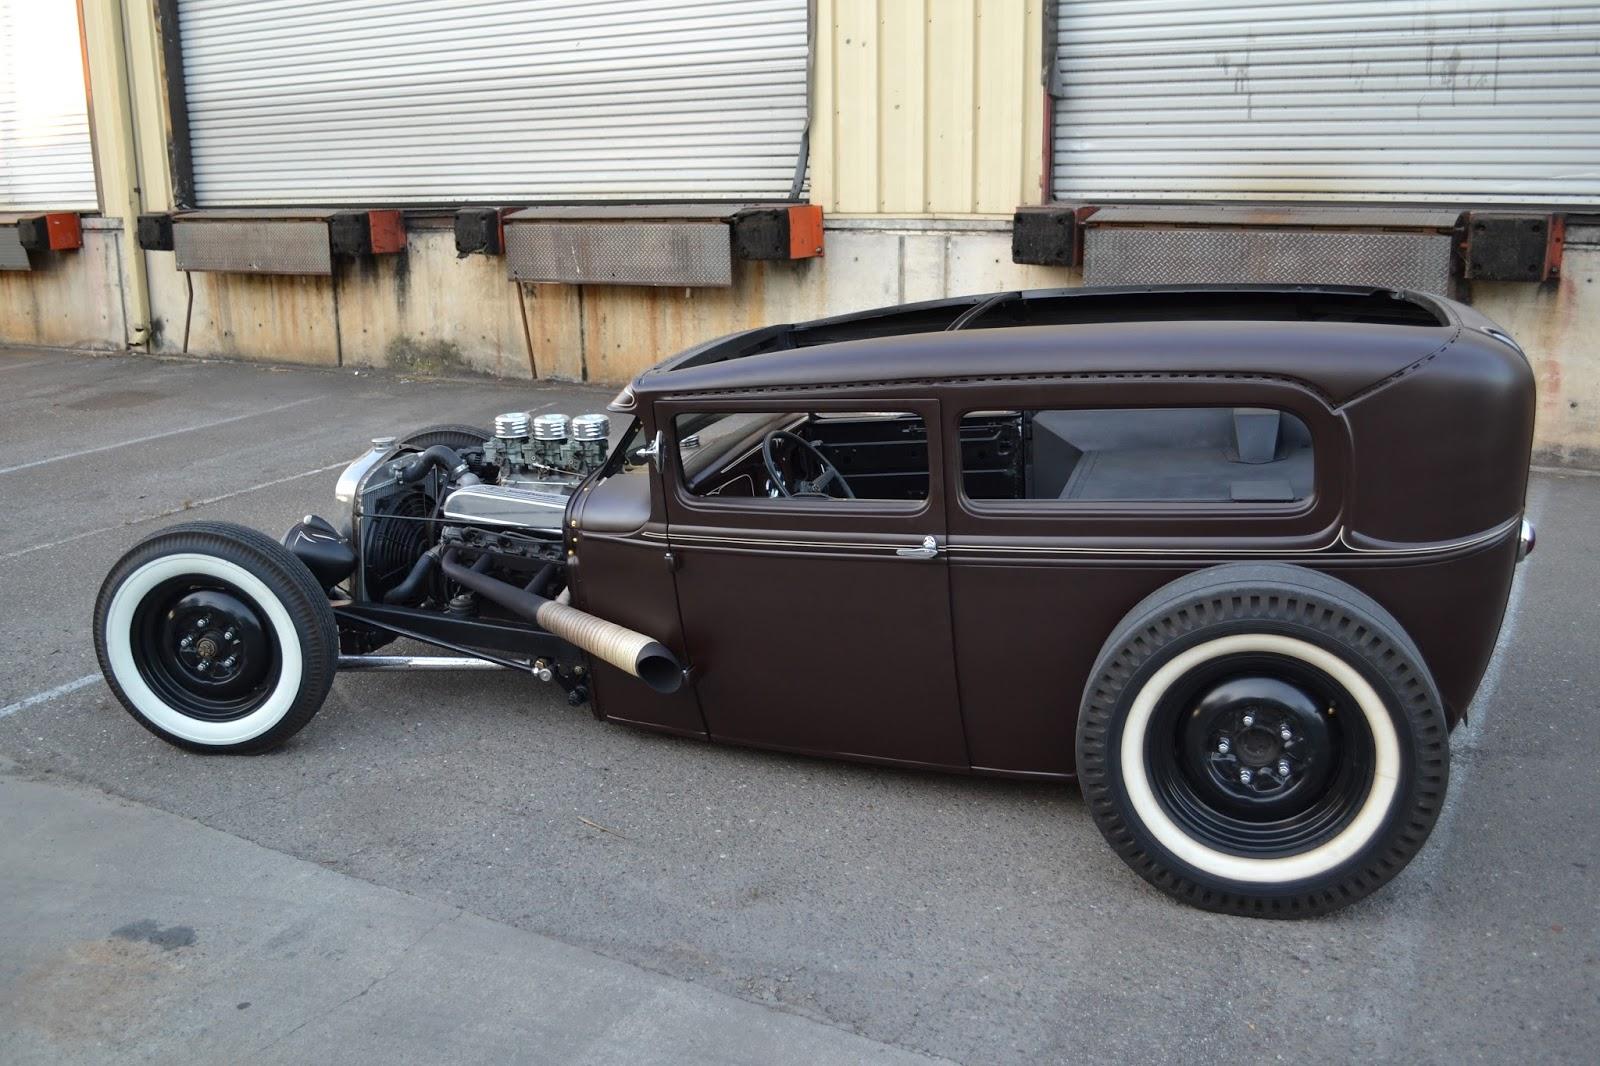 Chuckles Garage 1930 Ford Tudor